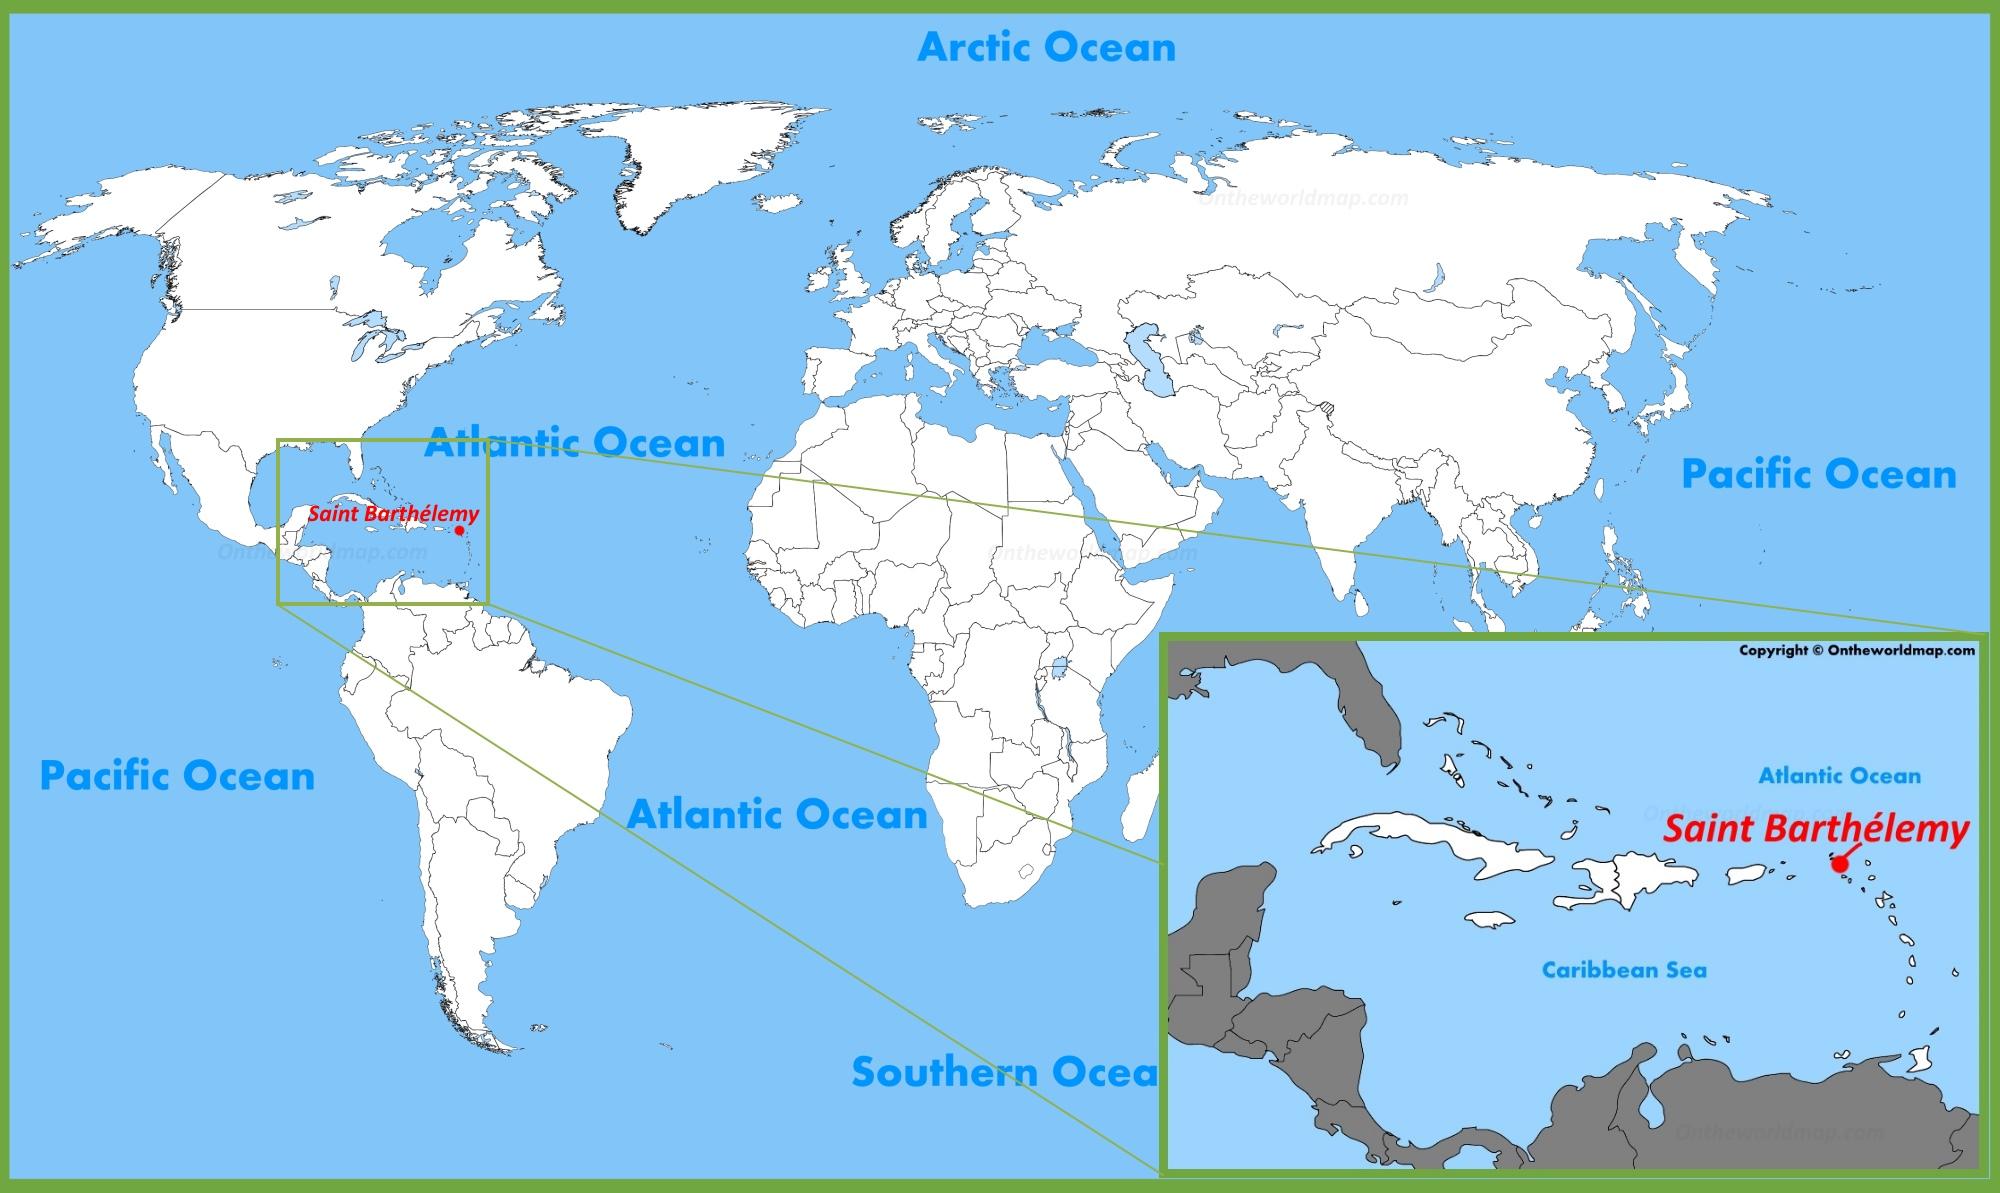 Saint Barthélemy Location on the World Map